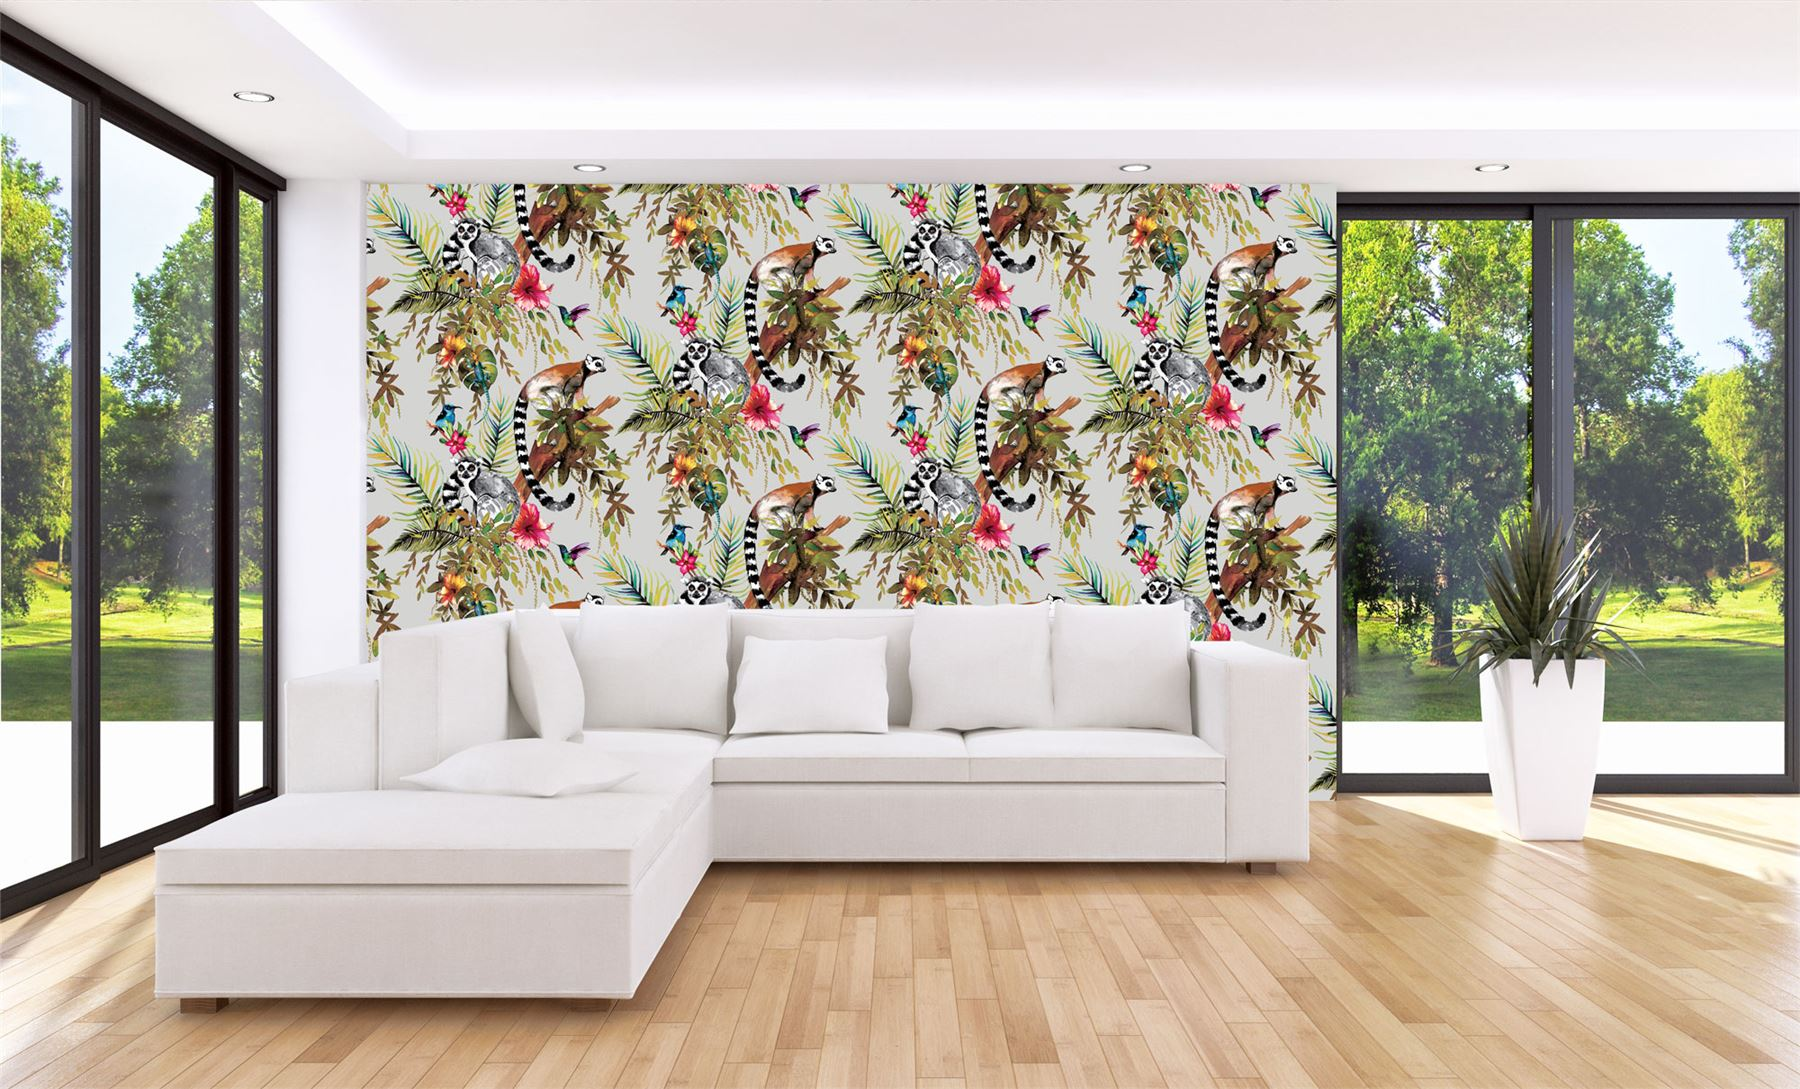 Lemur-Wallpaper-Tropical-Jungle-Birds-Flowers-Floral-Trees-Animals-Holden-Decor